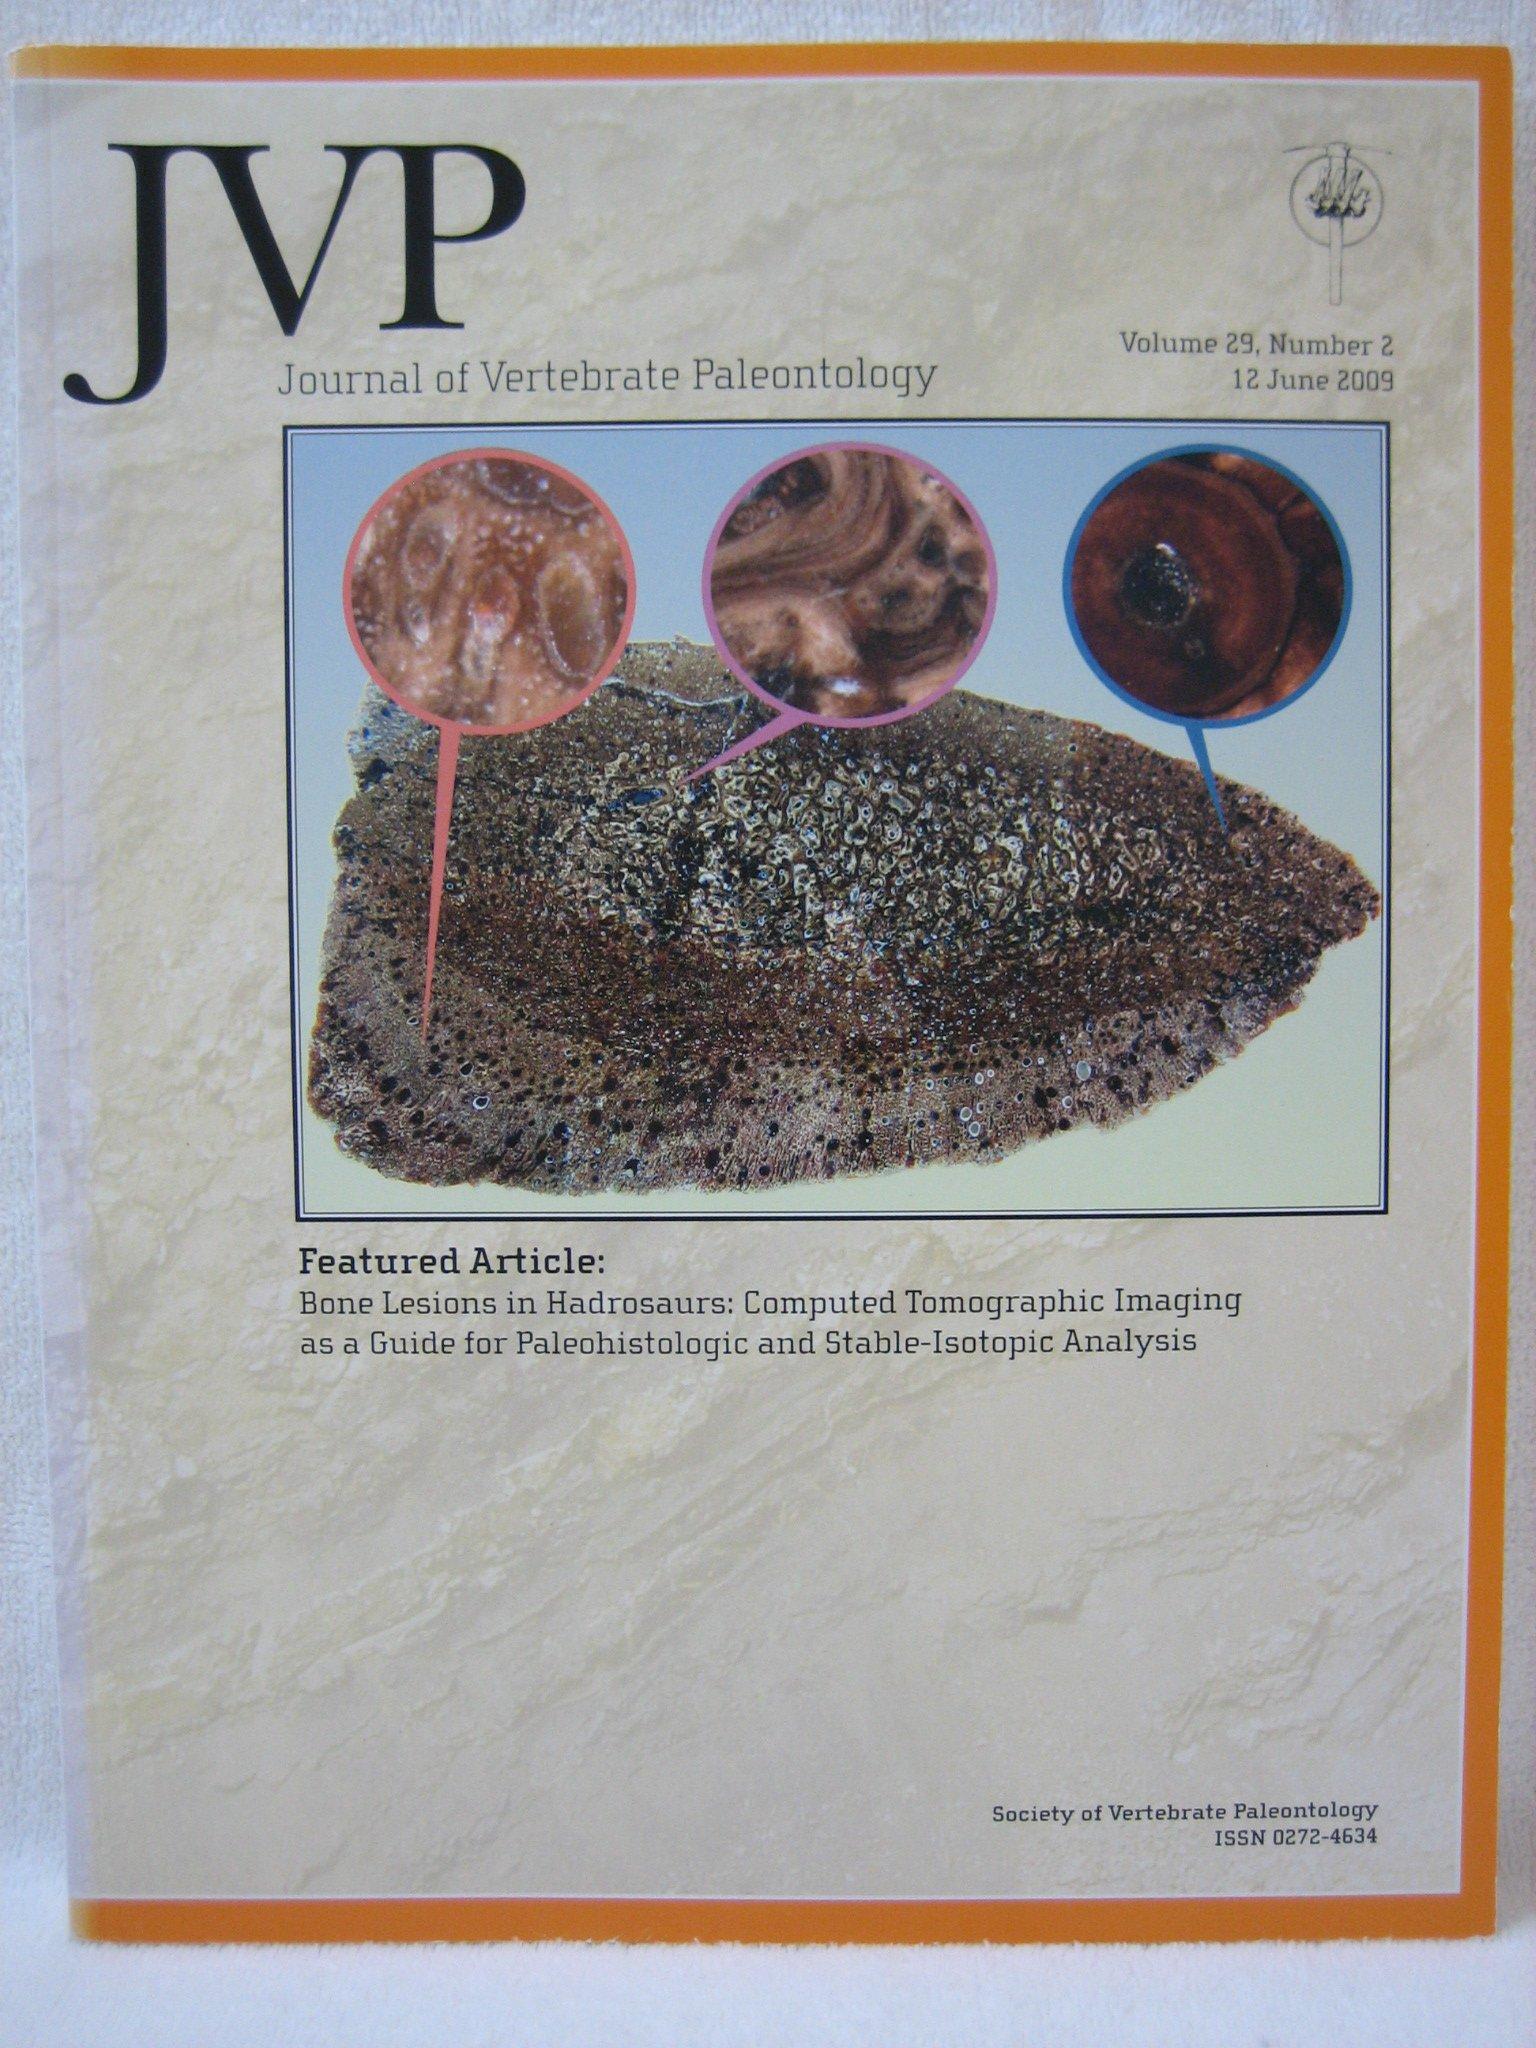 JVP - Journal of Vertebrate Paleontology Volume 29 Number 2 (12 June 2009)